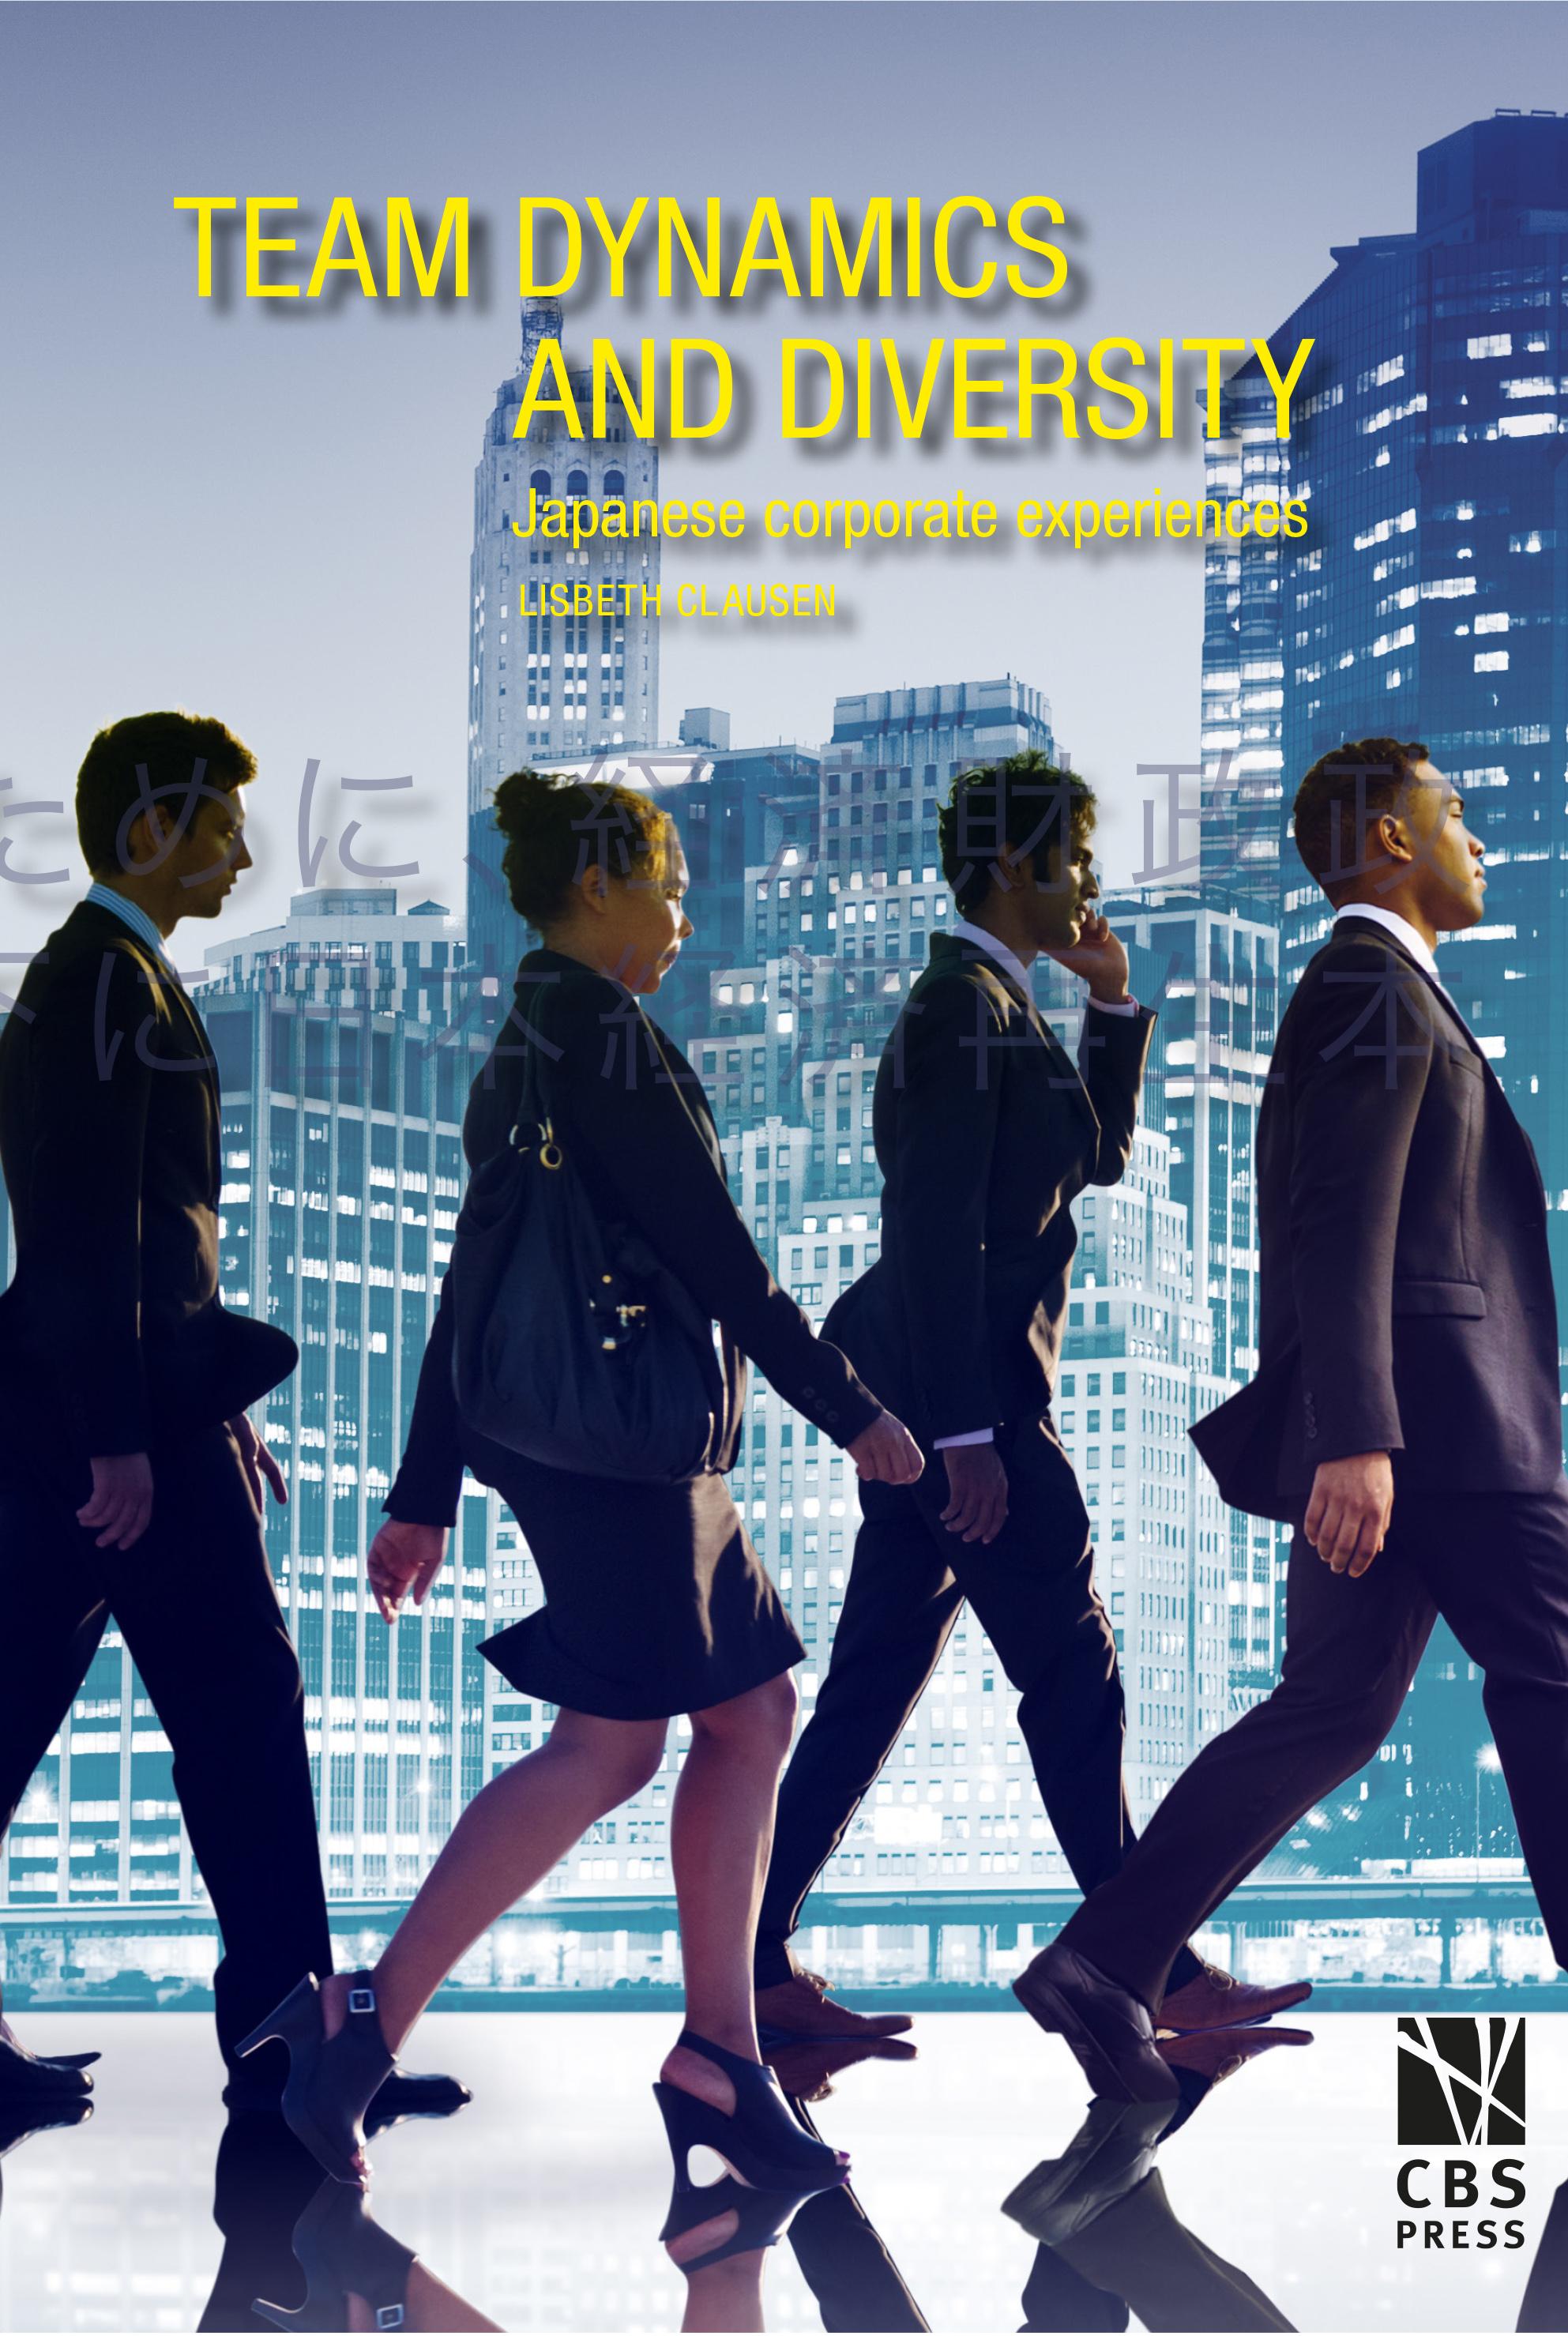 Team Dynamics and Diversity